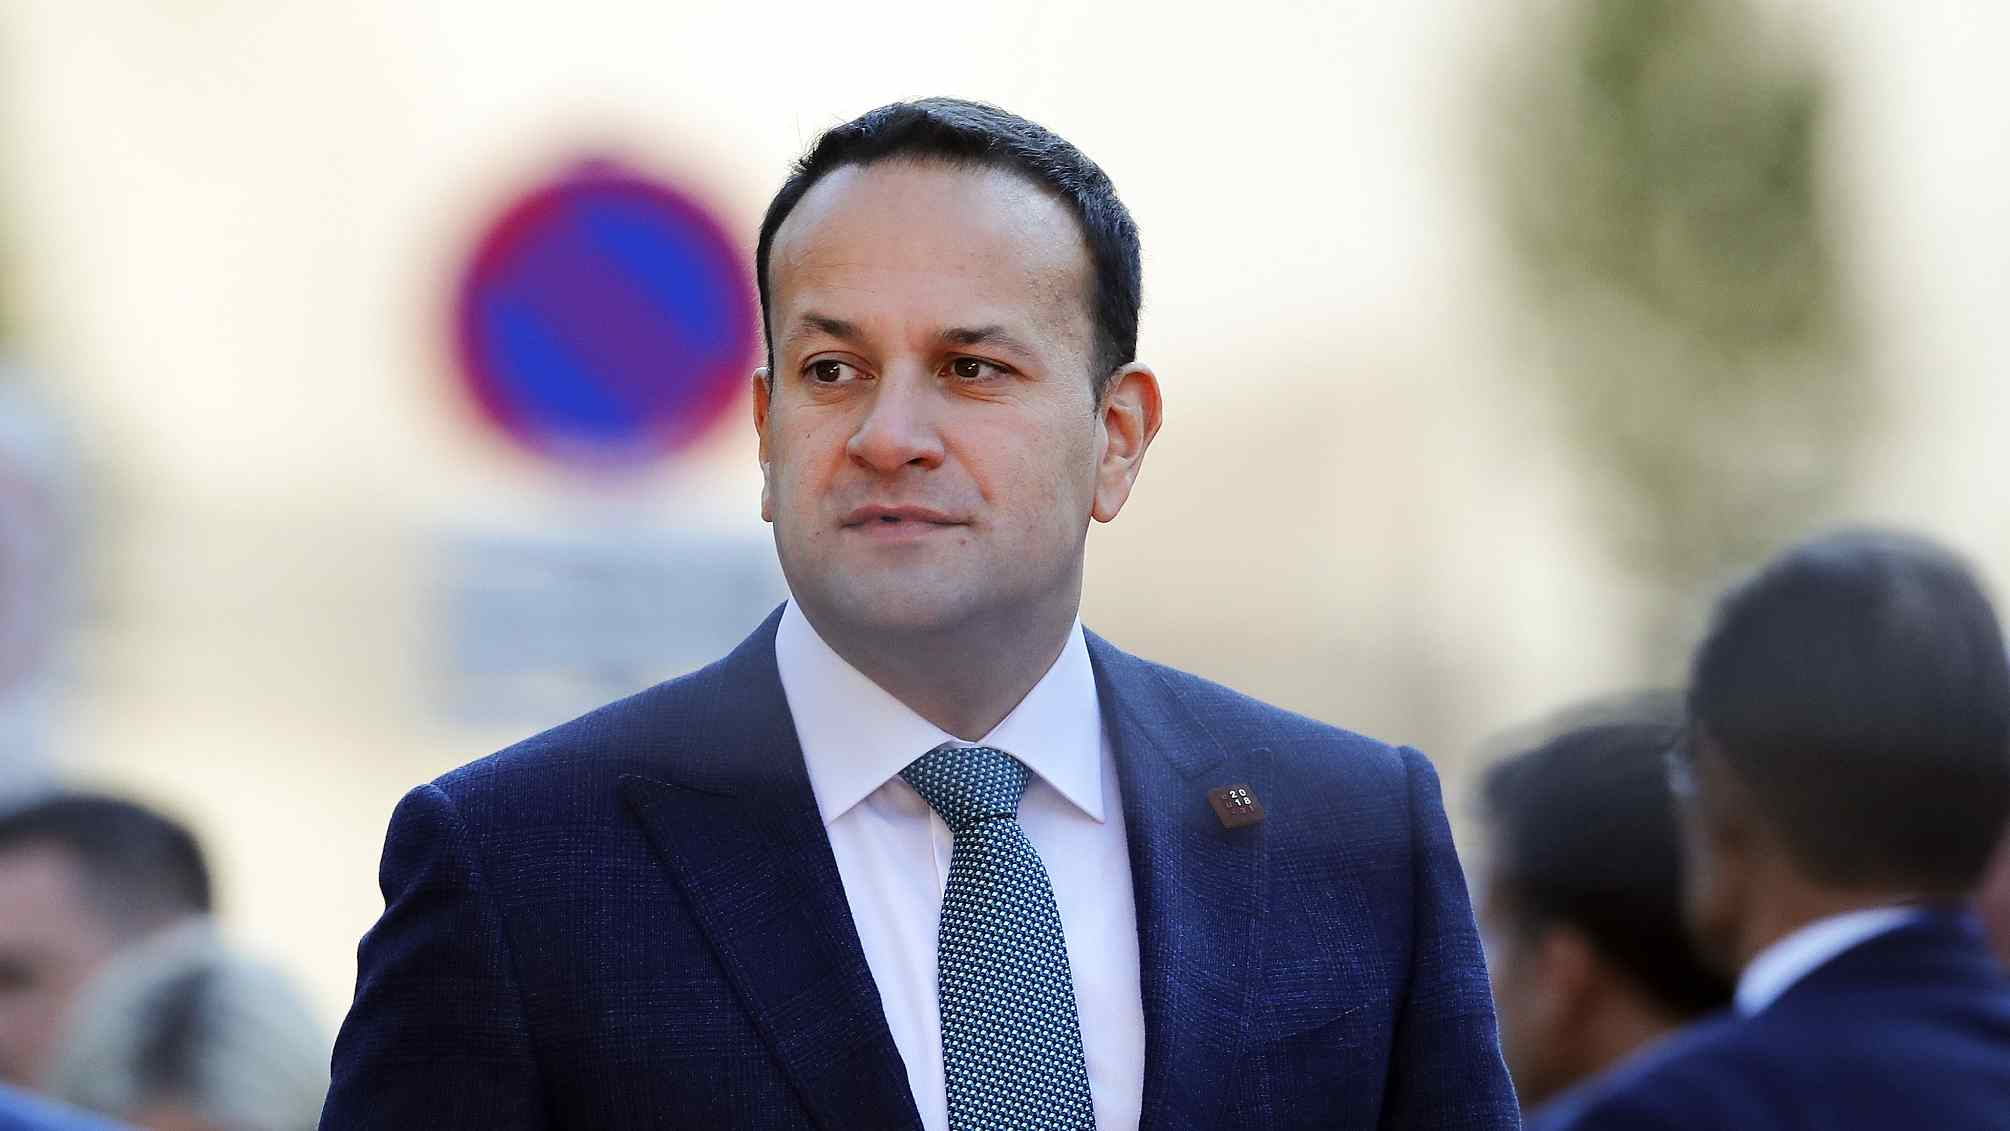 Irish government reshuffled following recent crisis